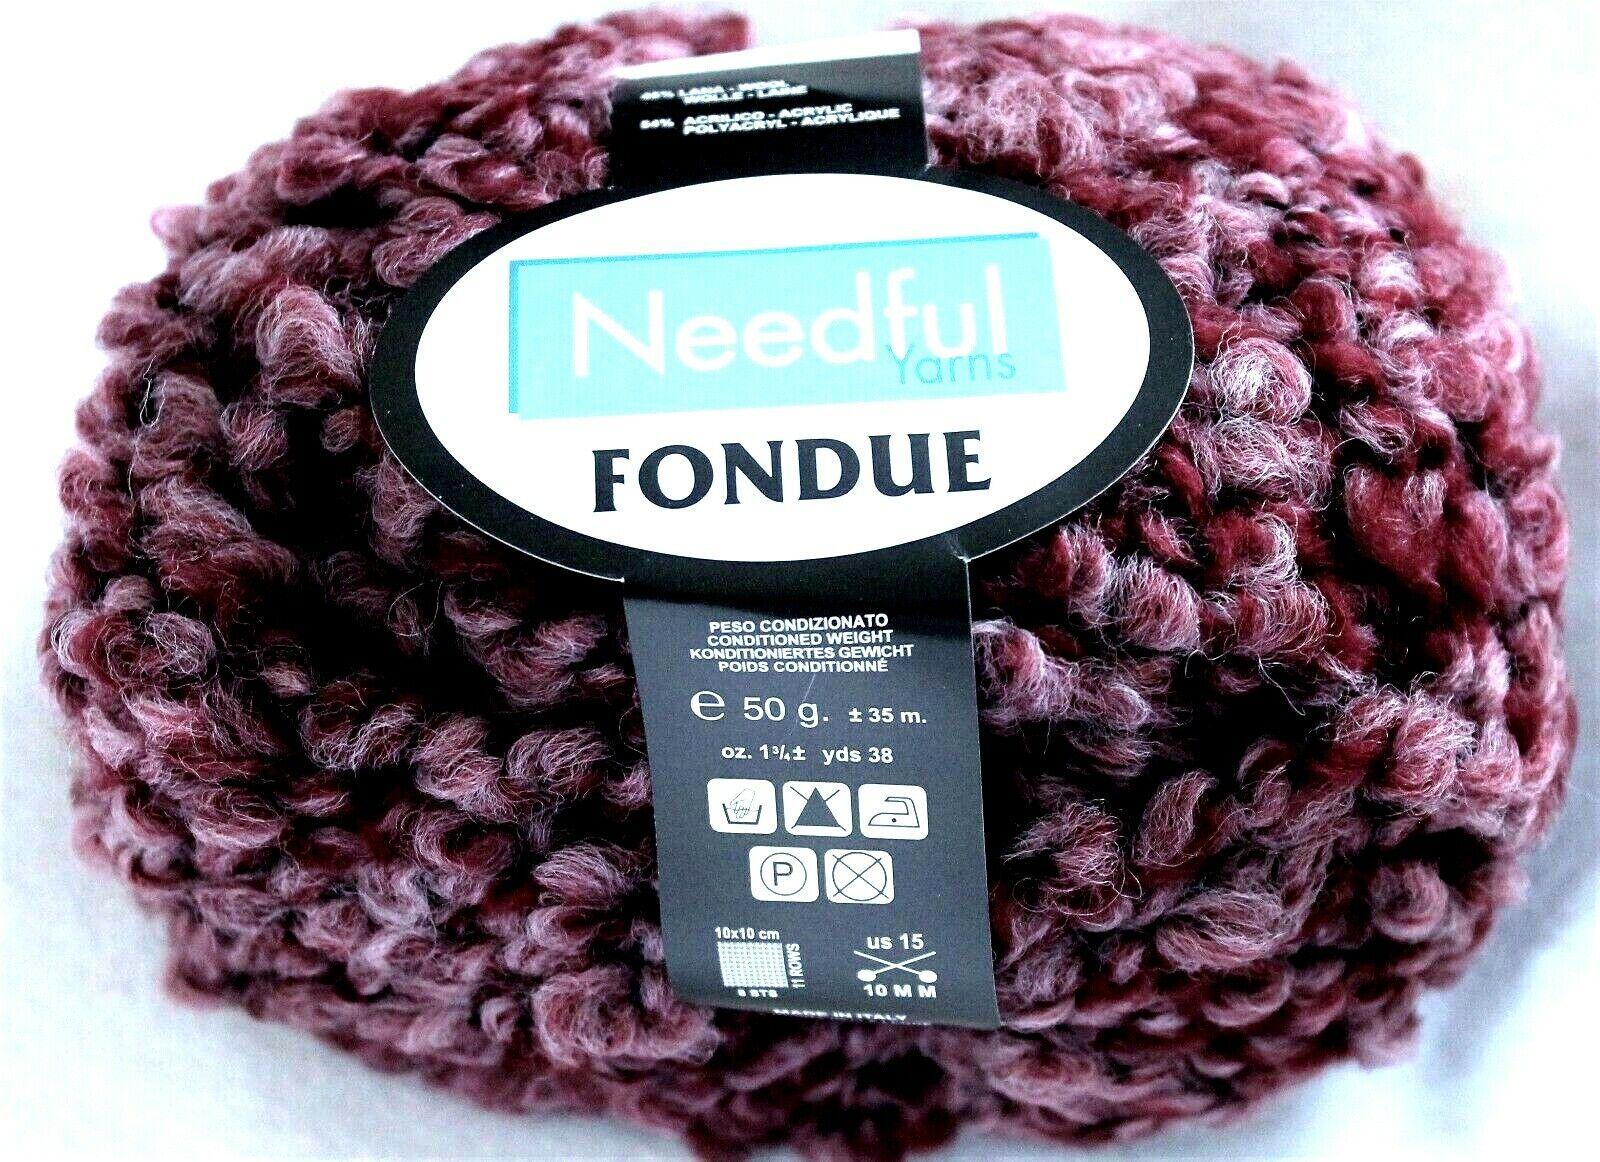 Needful Yarns FONDUE Lamb-Soft Wool Boucle Yarn #4935 Plum Burgundy SALE